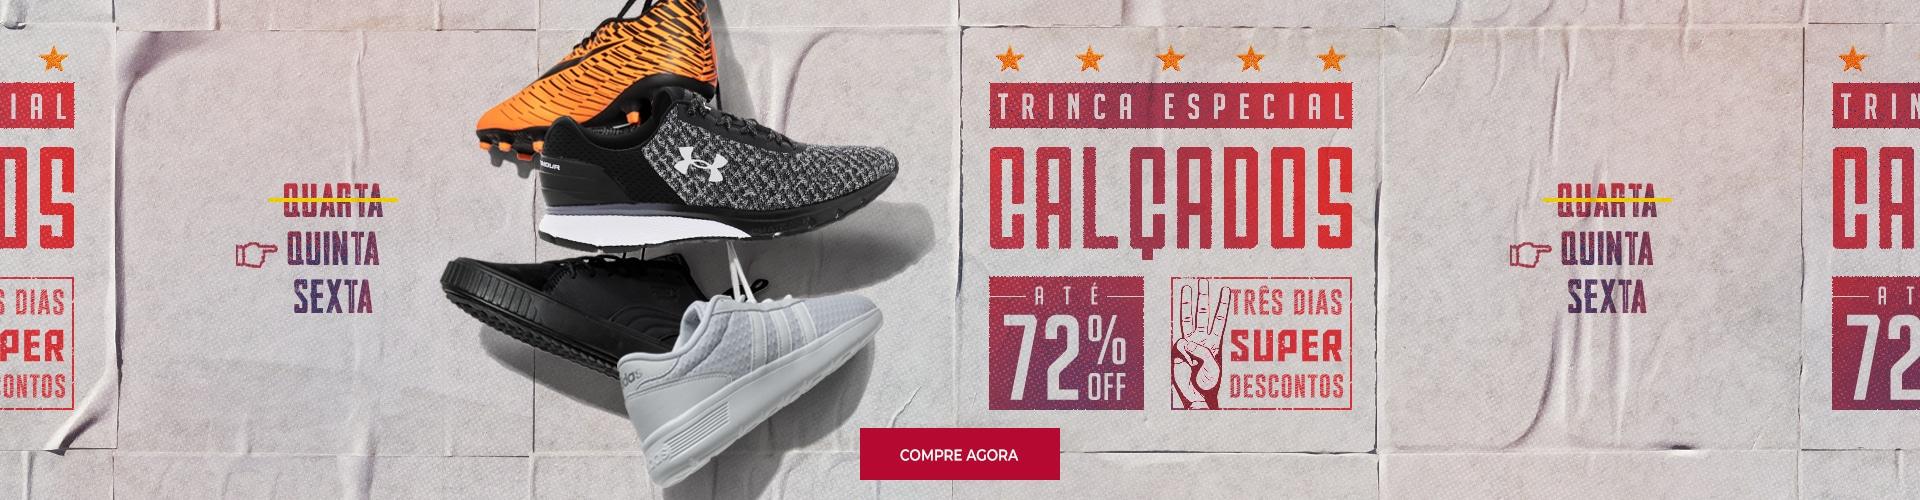 bcbe9487b8 Centauro Loja de Esportes - Nike